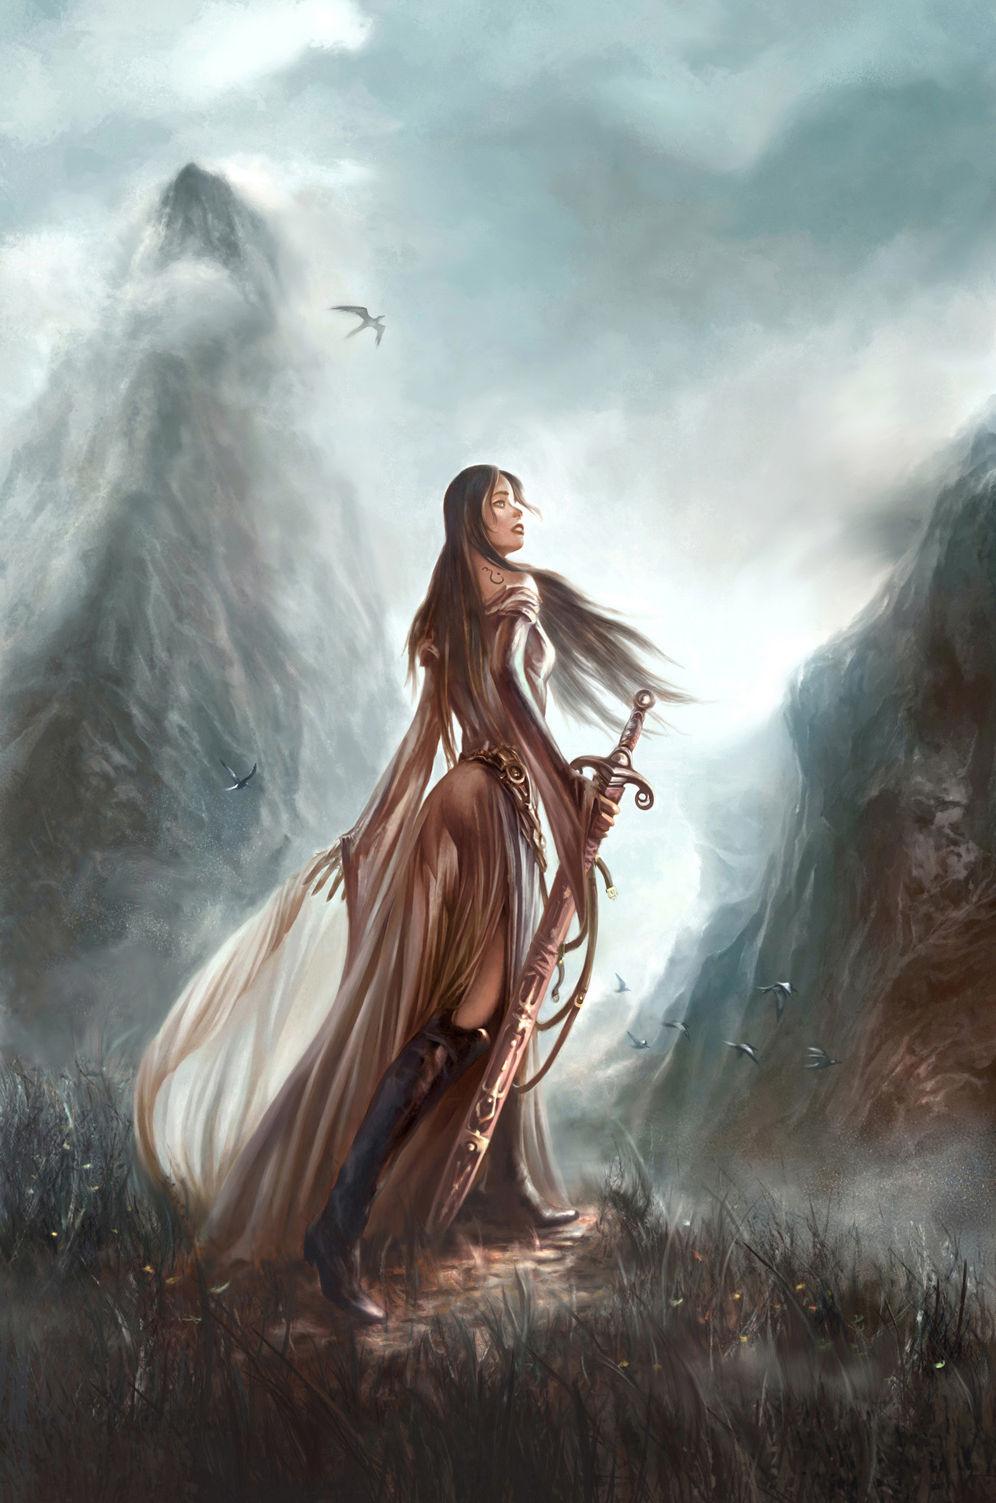 The warrior art id 7080 art abyss - Fantasy female warrior artwork ...